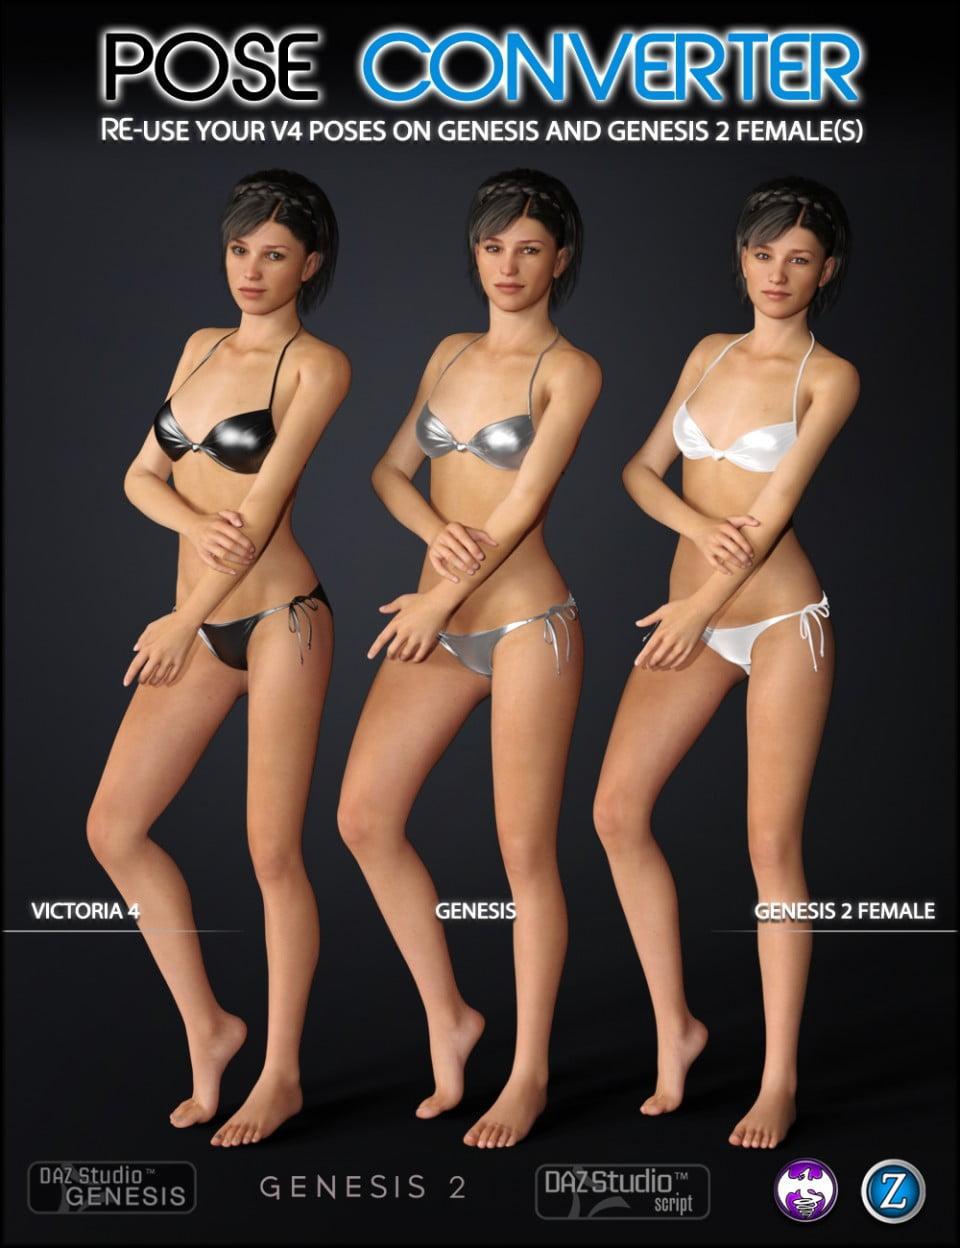 00-main-v4-pose-converter-for-genesis-and-genesis-2-females-daz3d